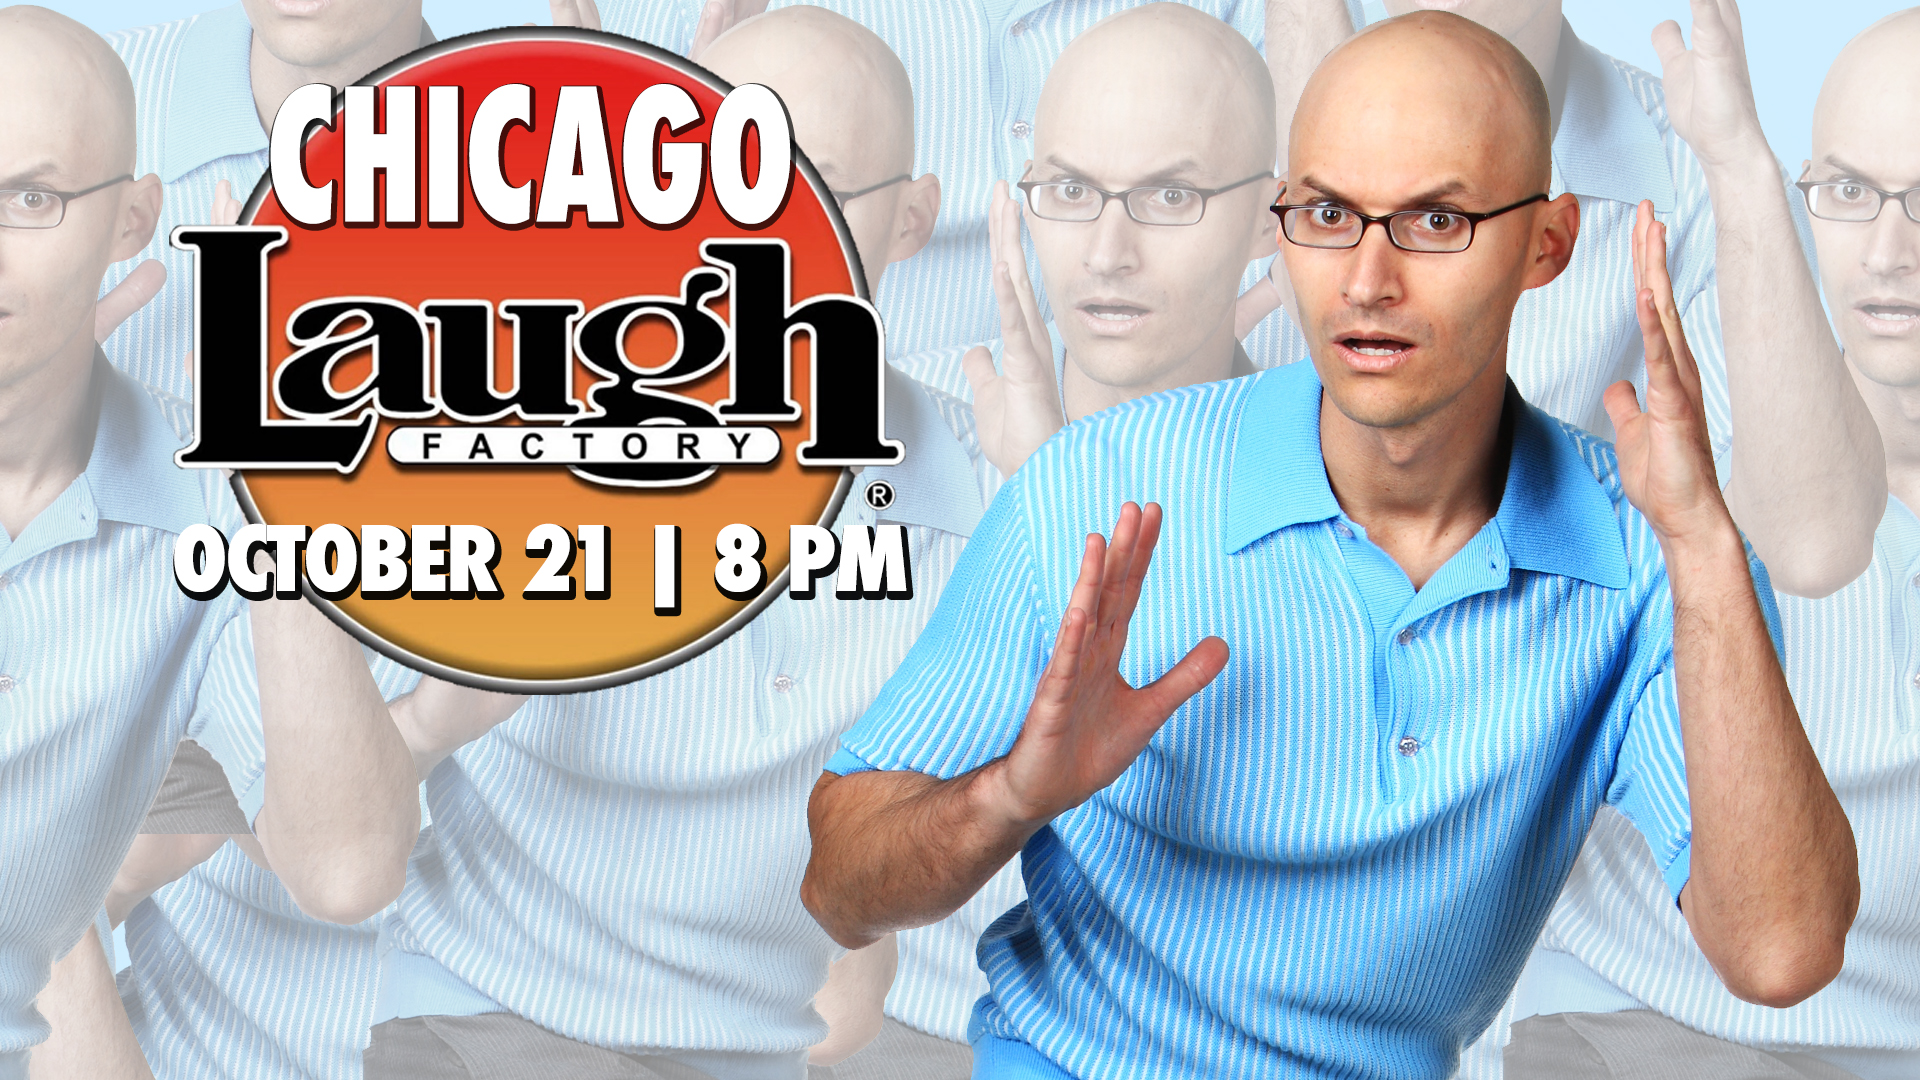 Chicago-Laugh-Factory-10-21b-1